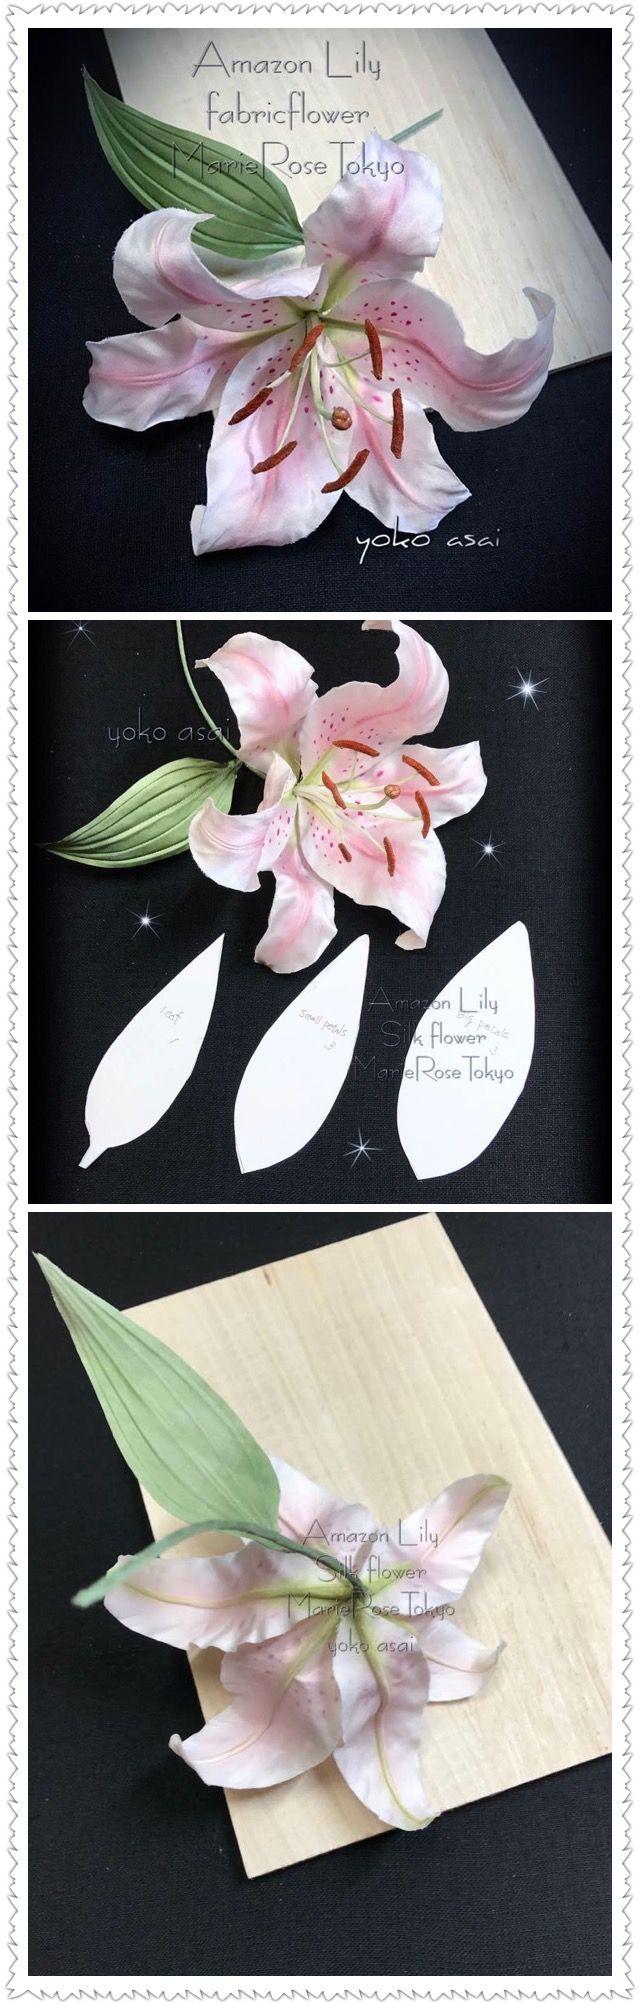 Amazon Lily by Yoko Asai